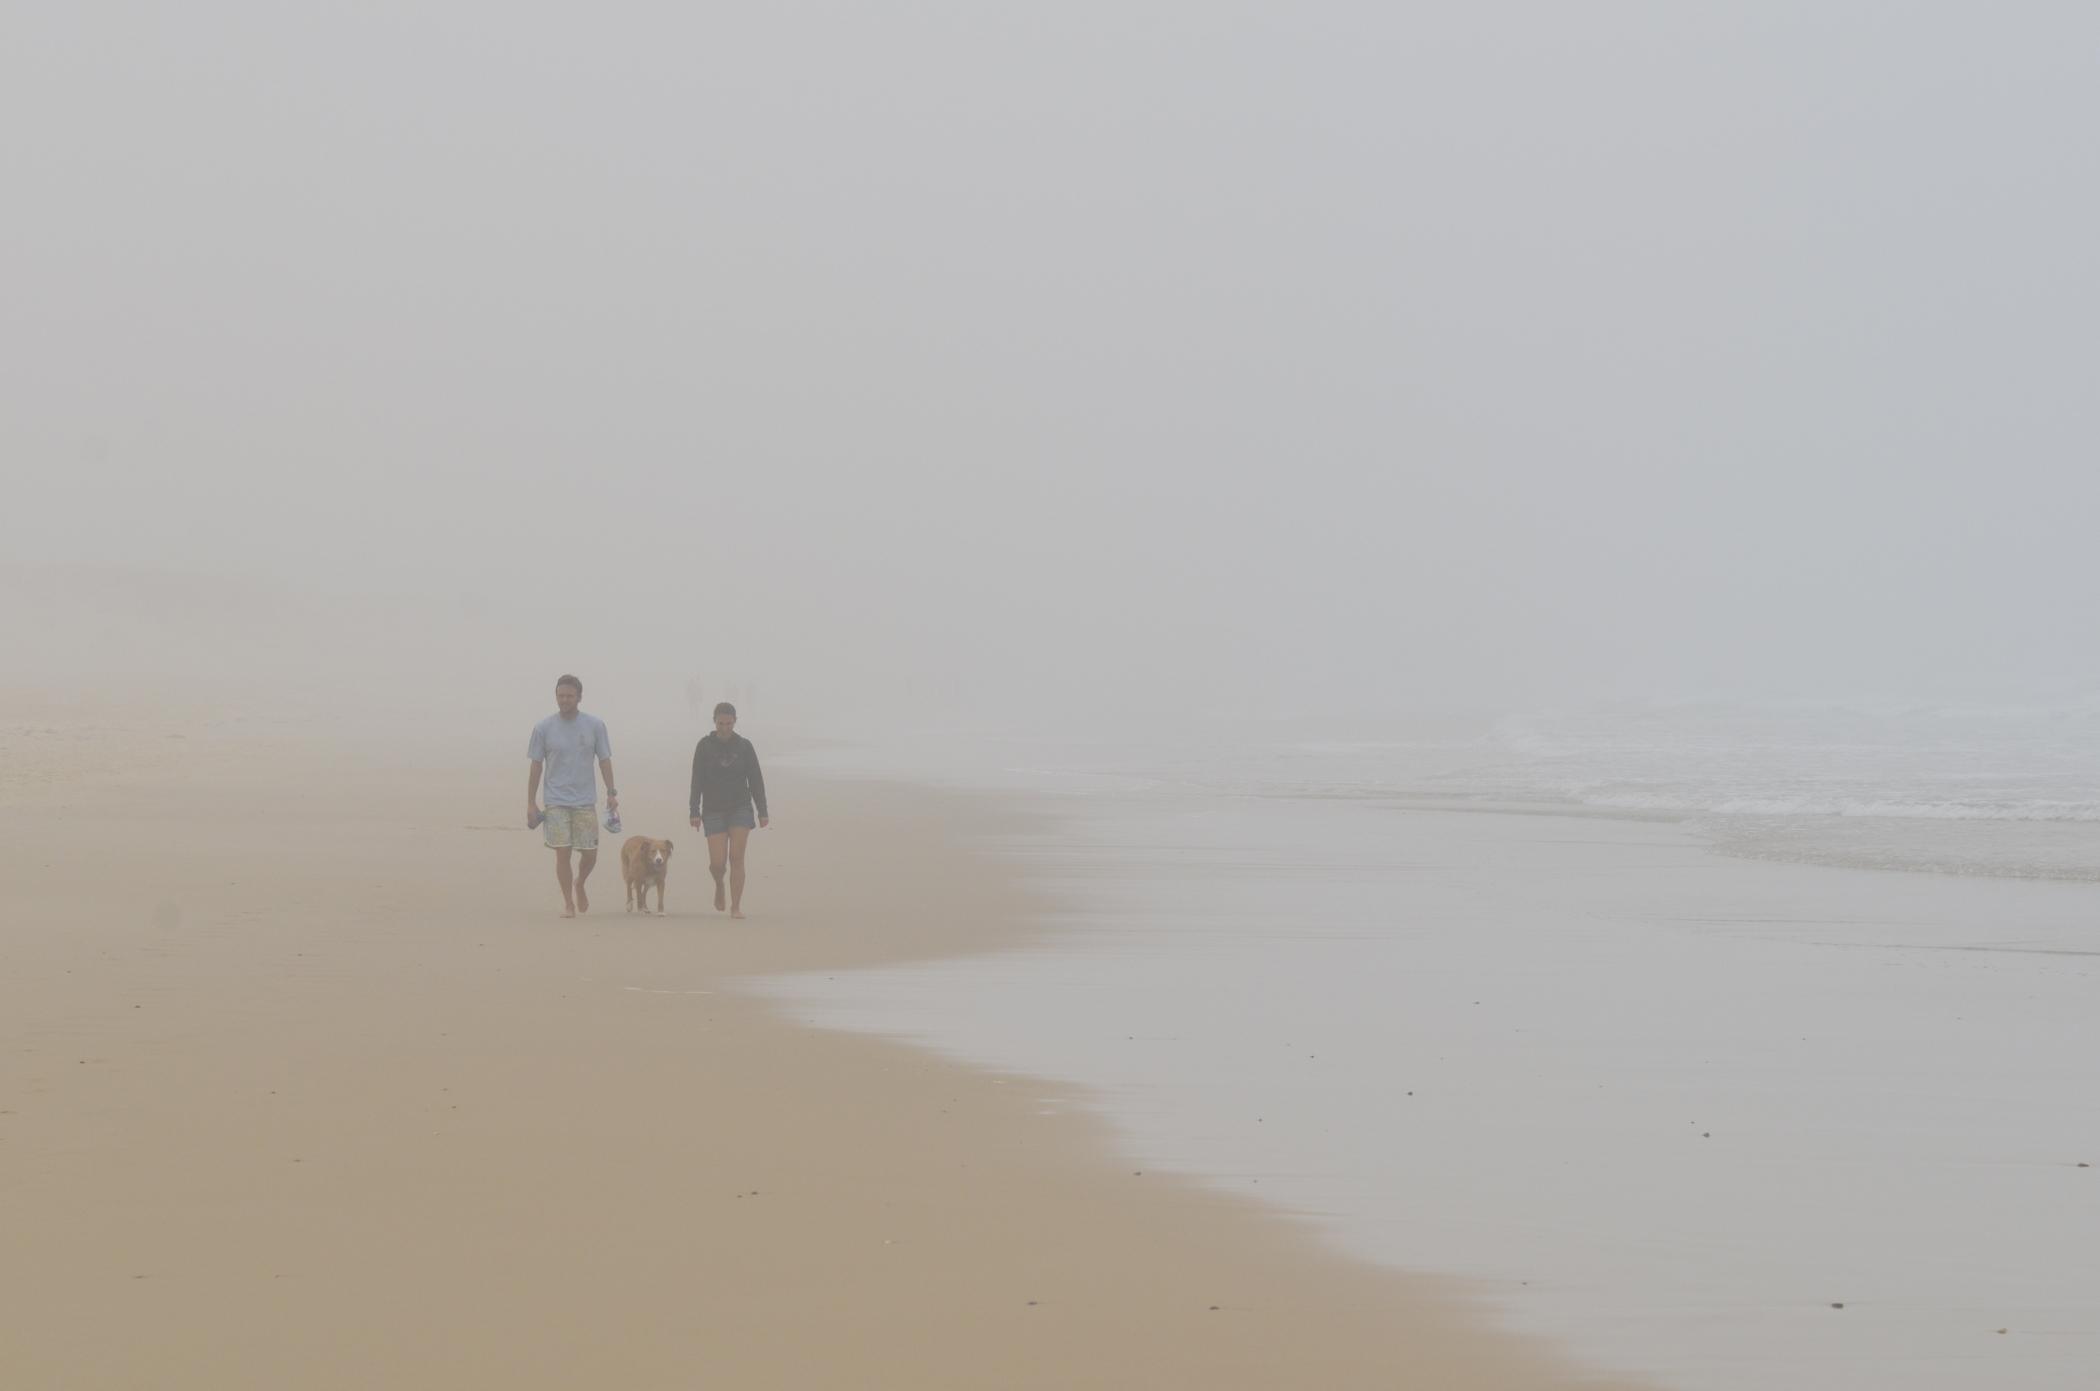 Surfguiding Peniche Hund am Strand